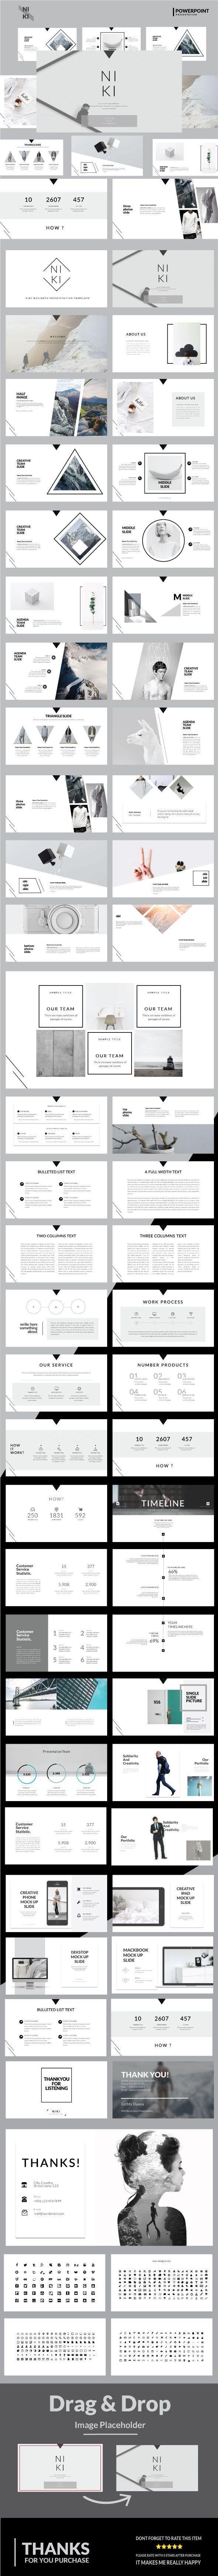 Niki Multipurpose Powerpoint Template - Business PowerPoint Templates